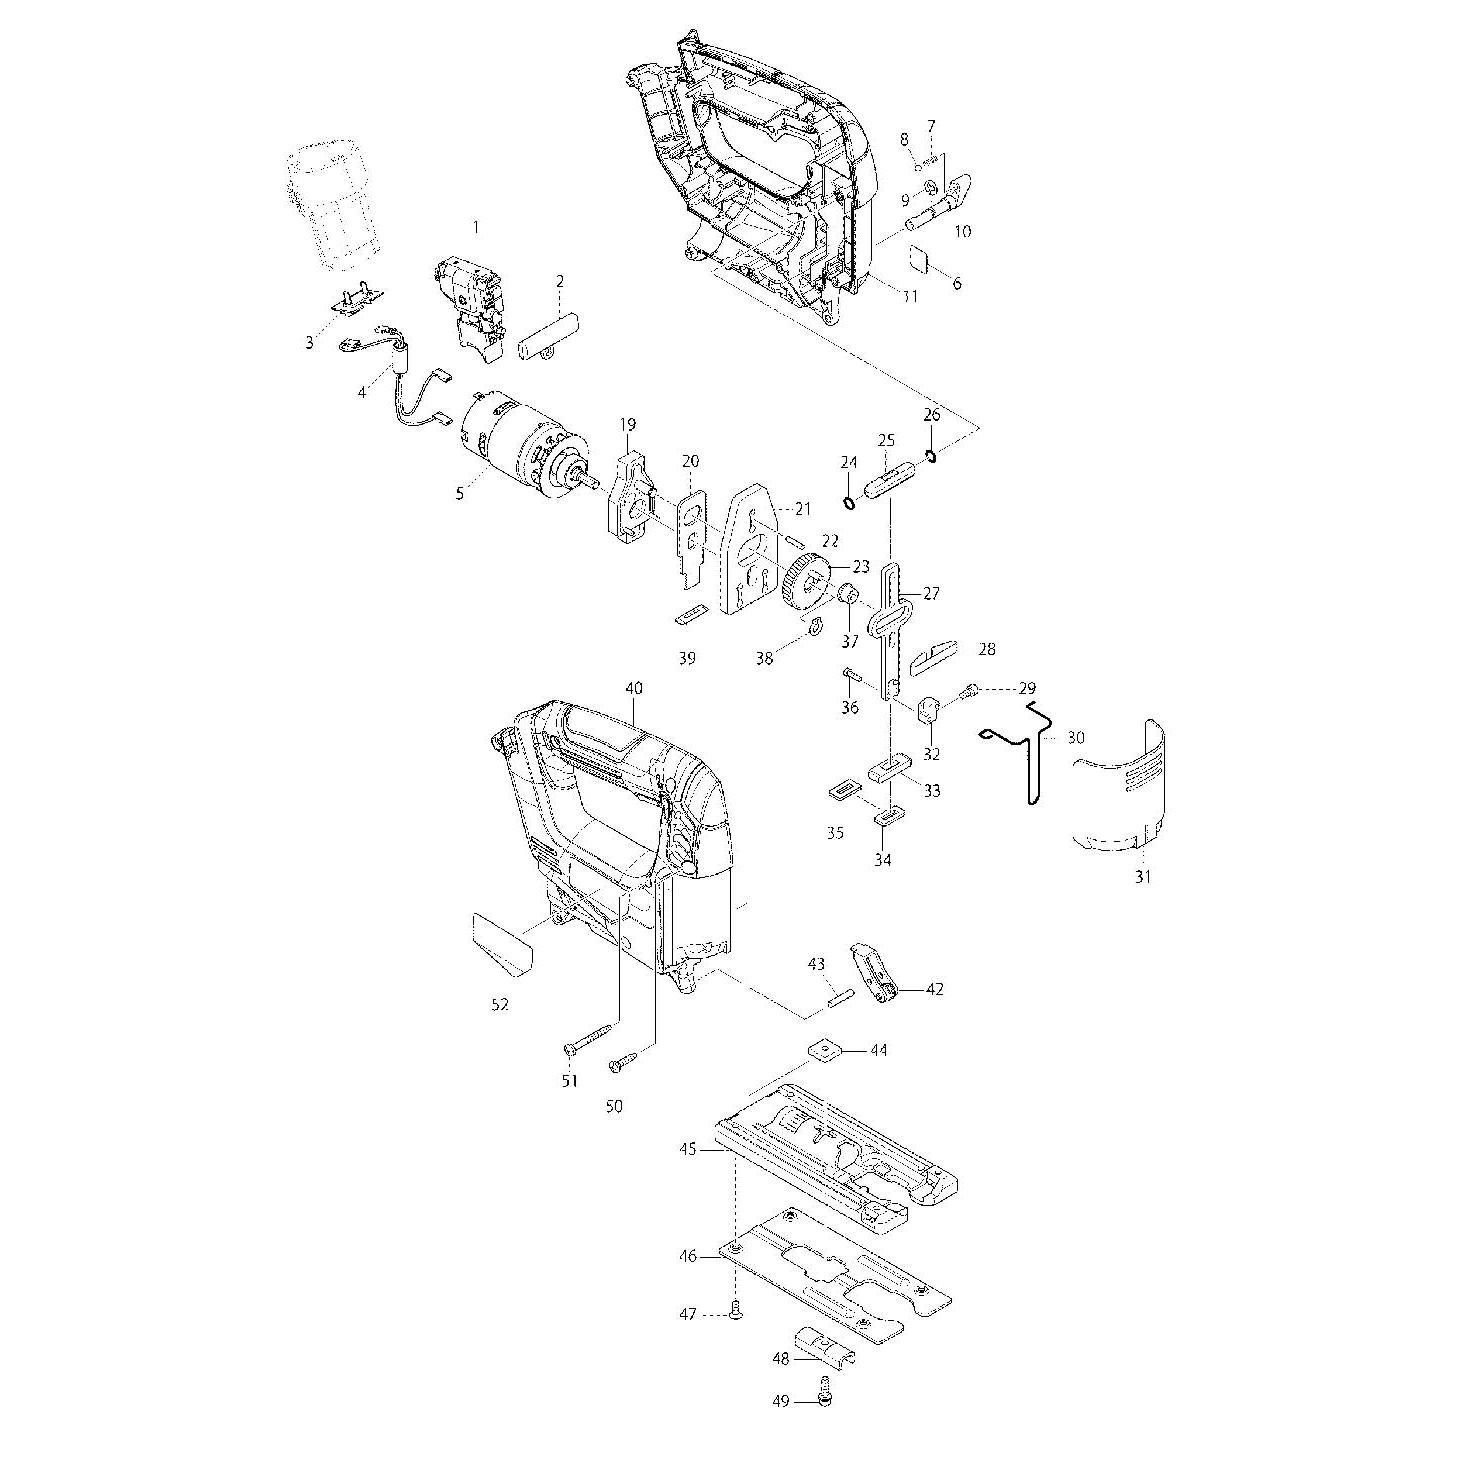 Buy A Makita JV100D GUIDE RULE SET 192732-4 Spare Part